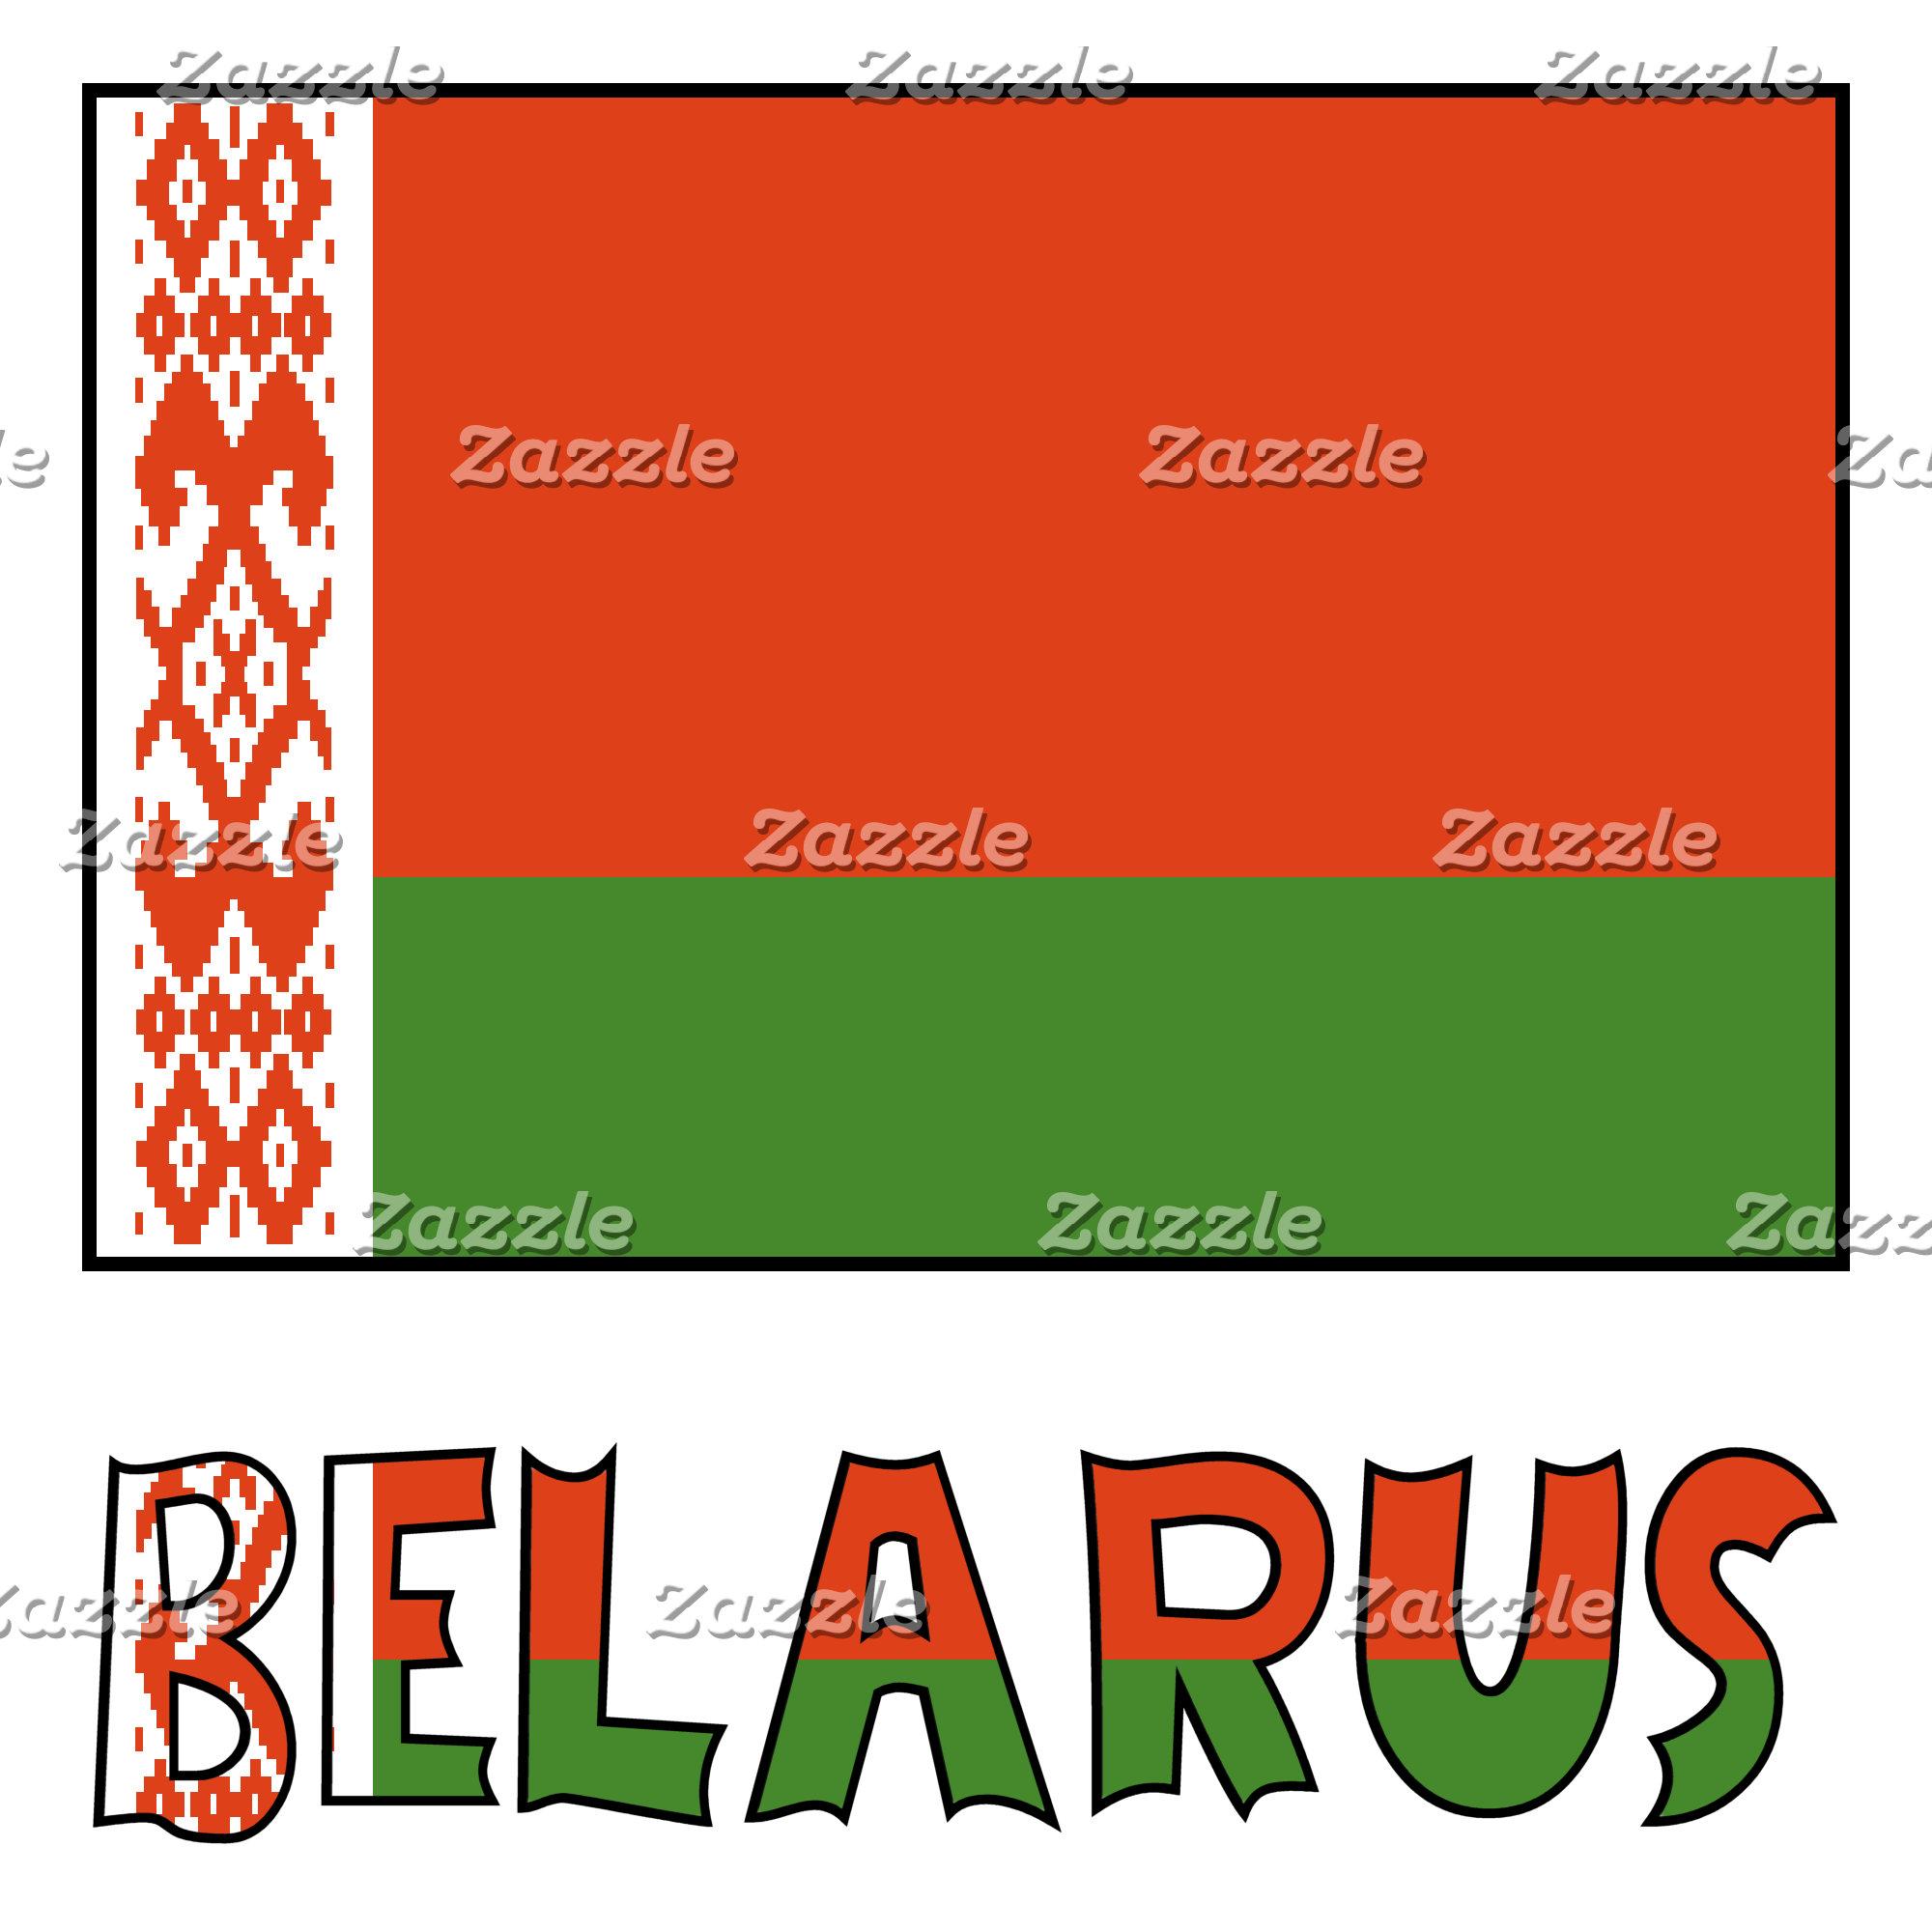 Belarusian Flag and Belarus